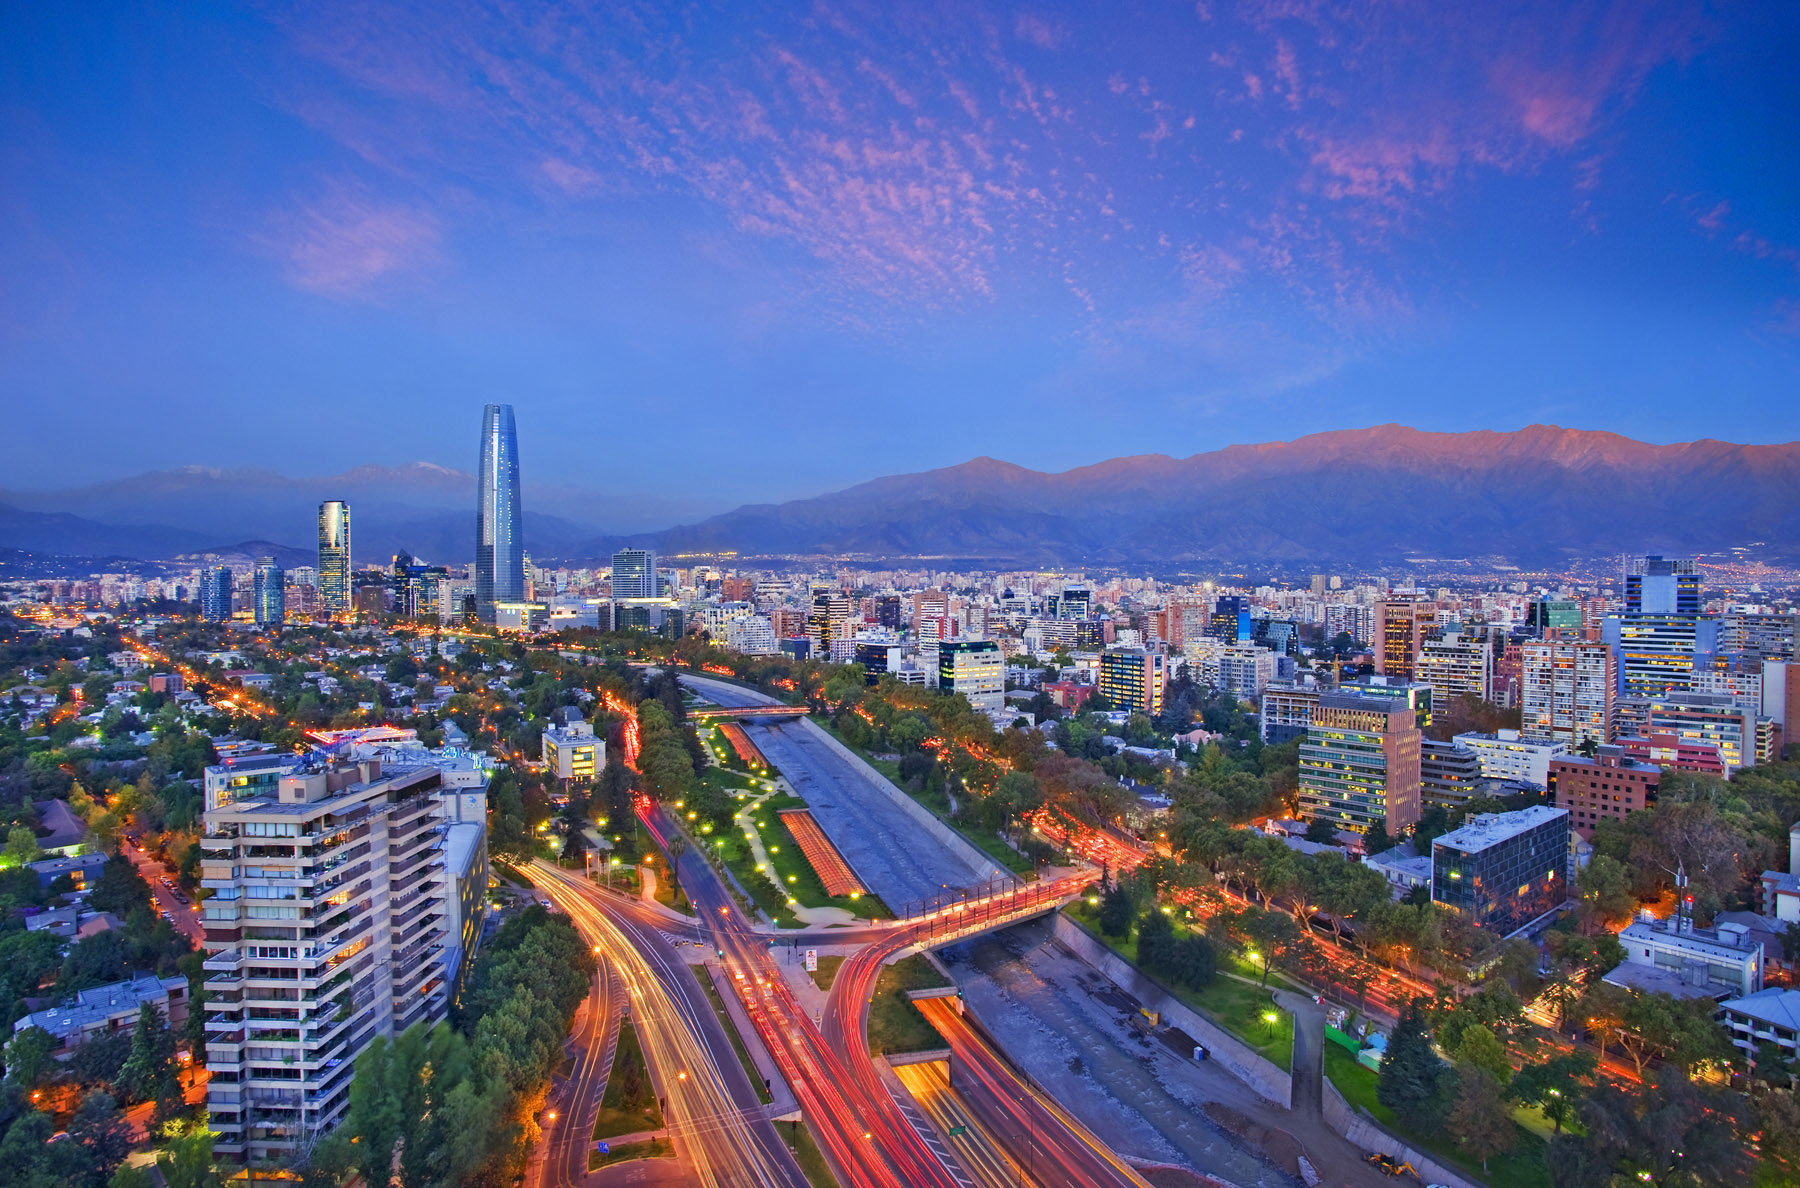 305_1santiago_chile_skyline